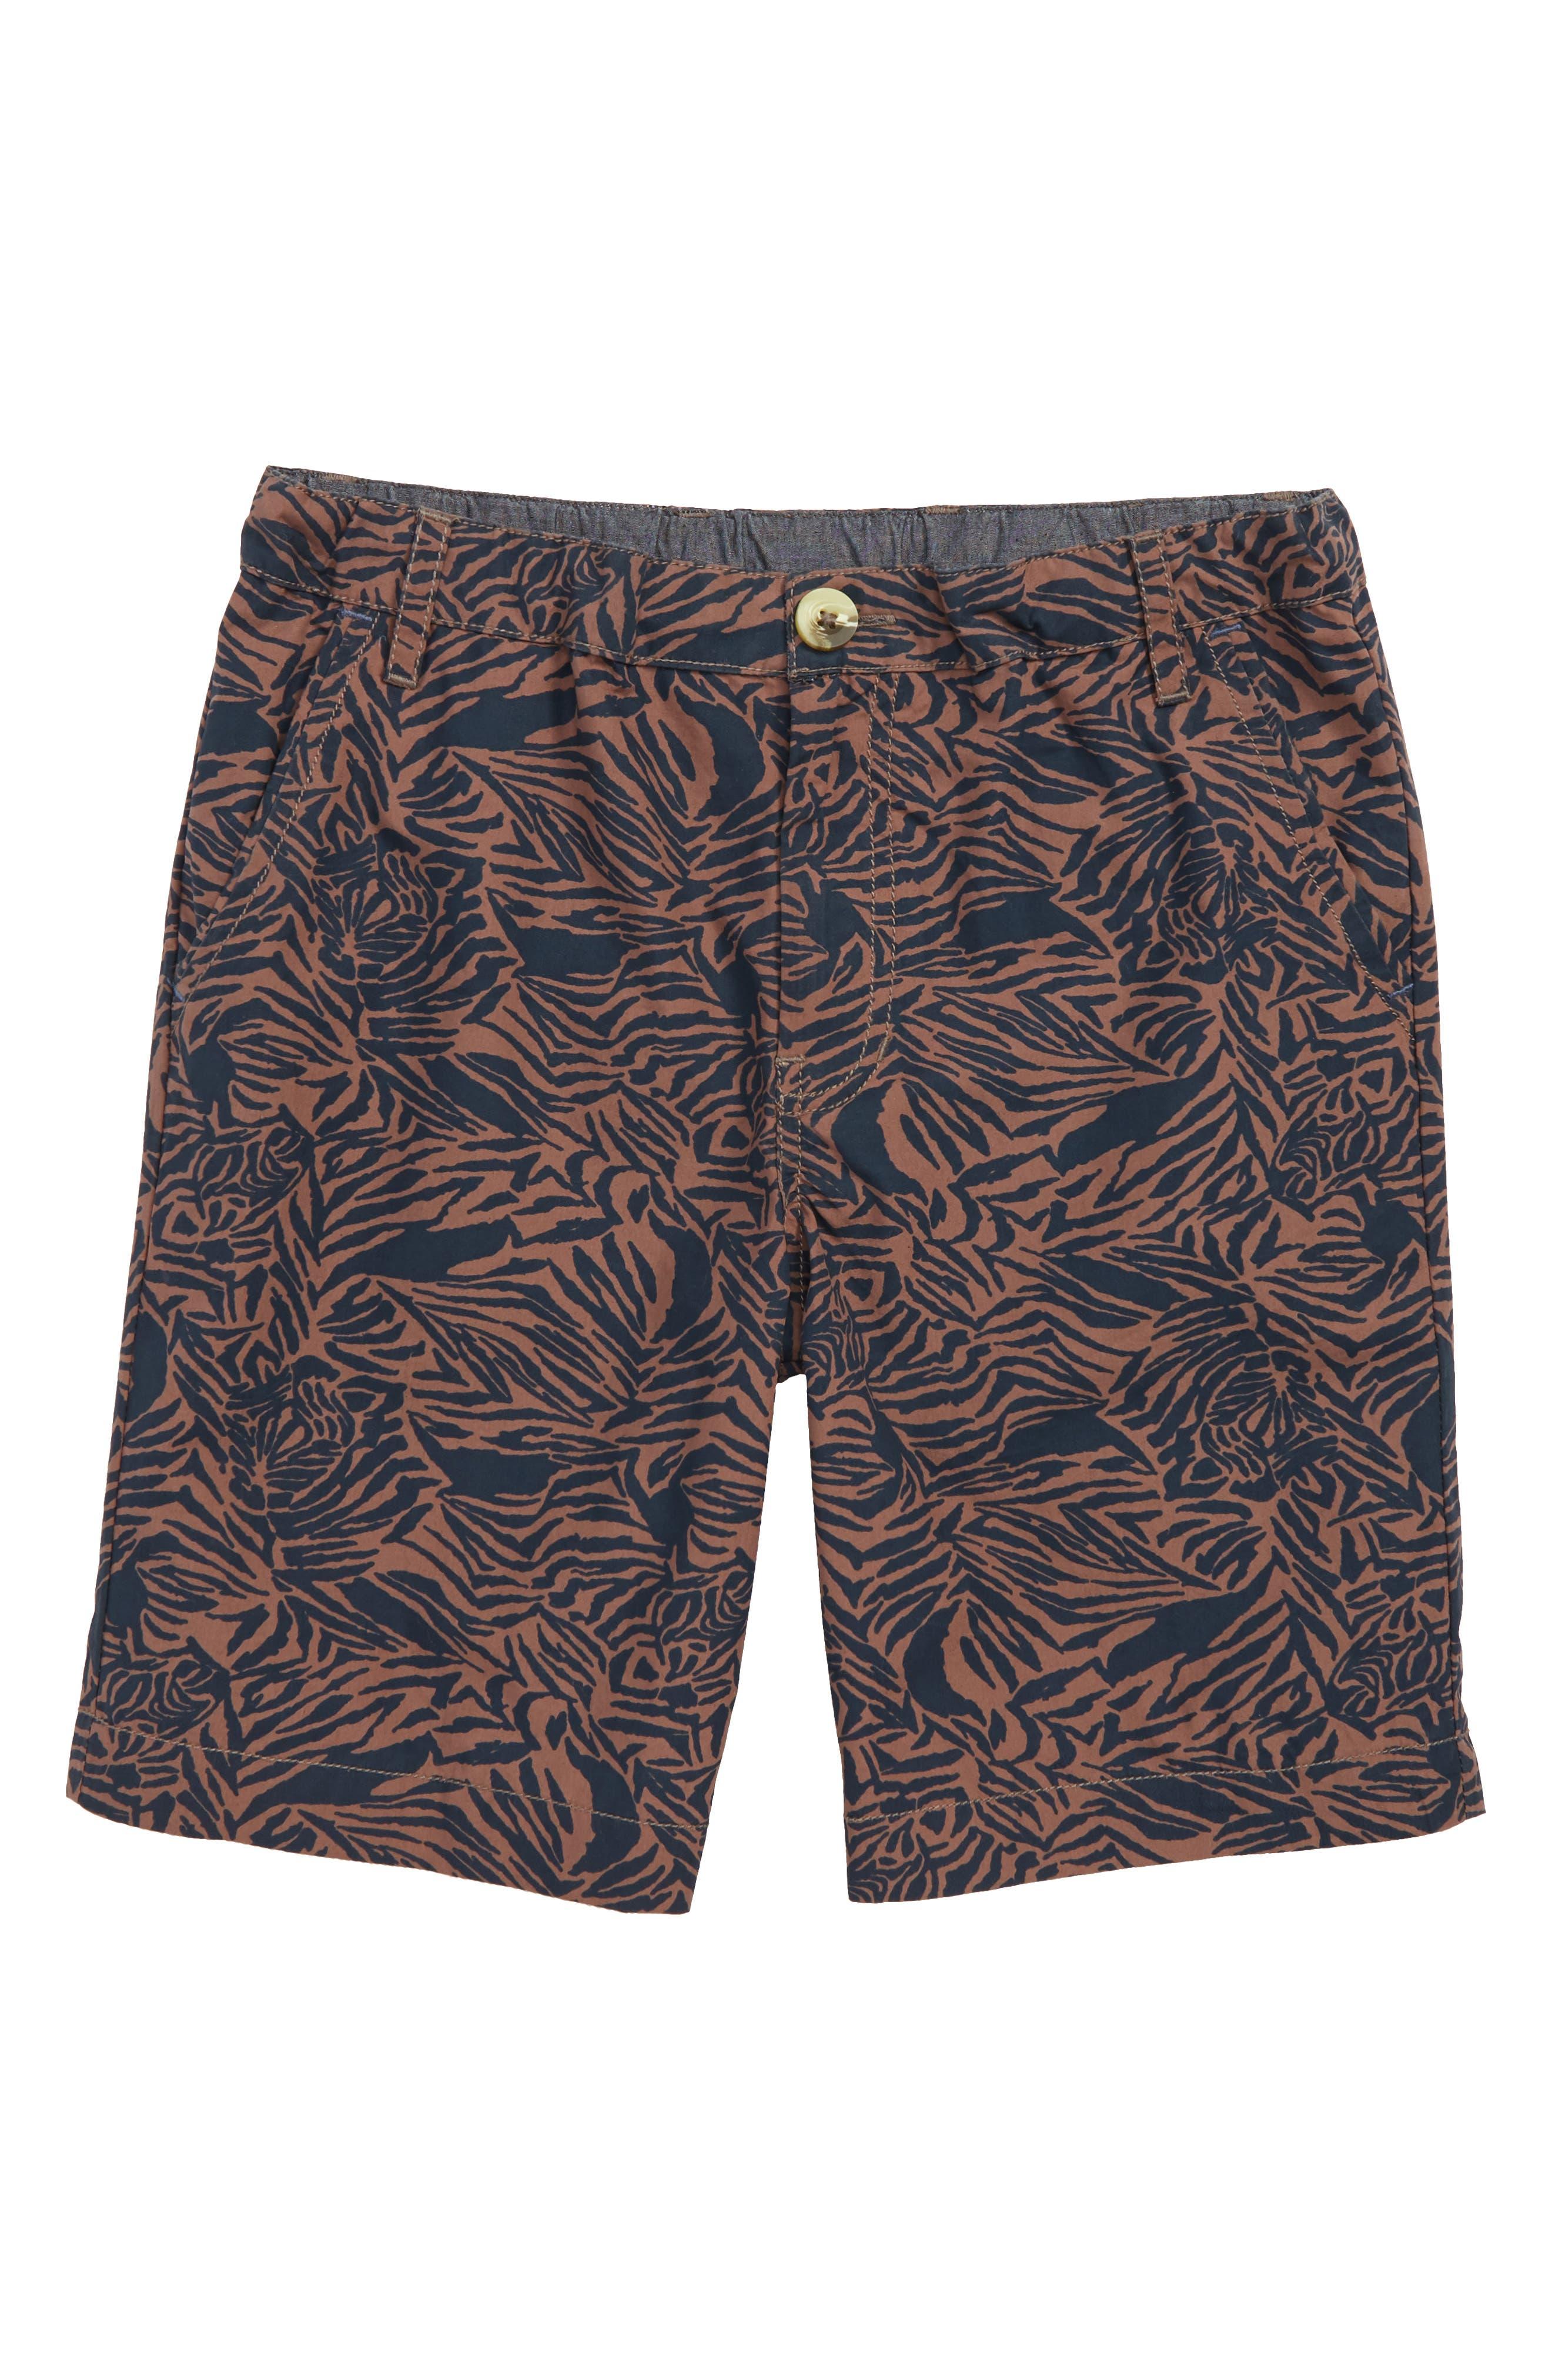 Zebra Shorts,                         Main,                         color, 200